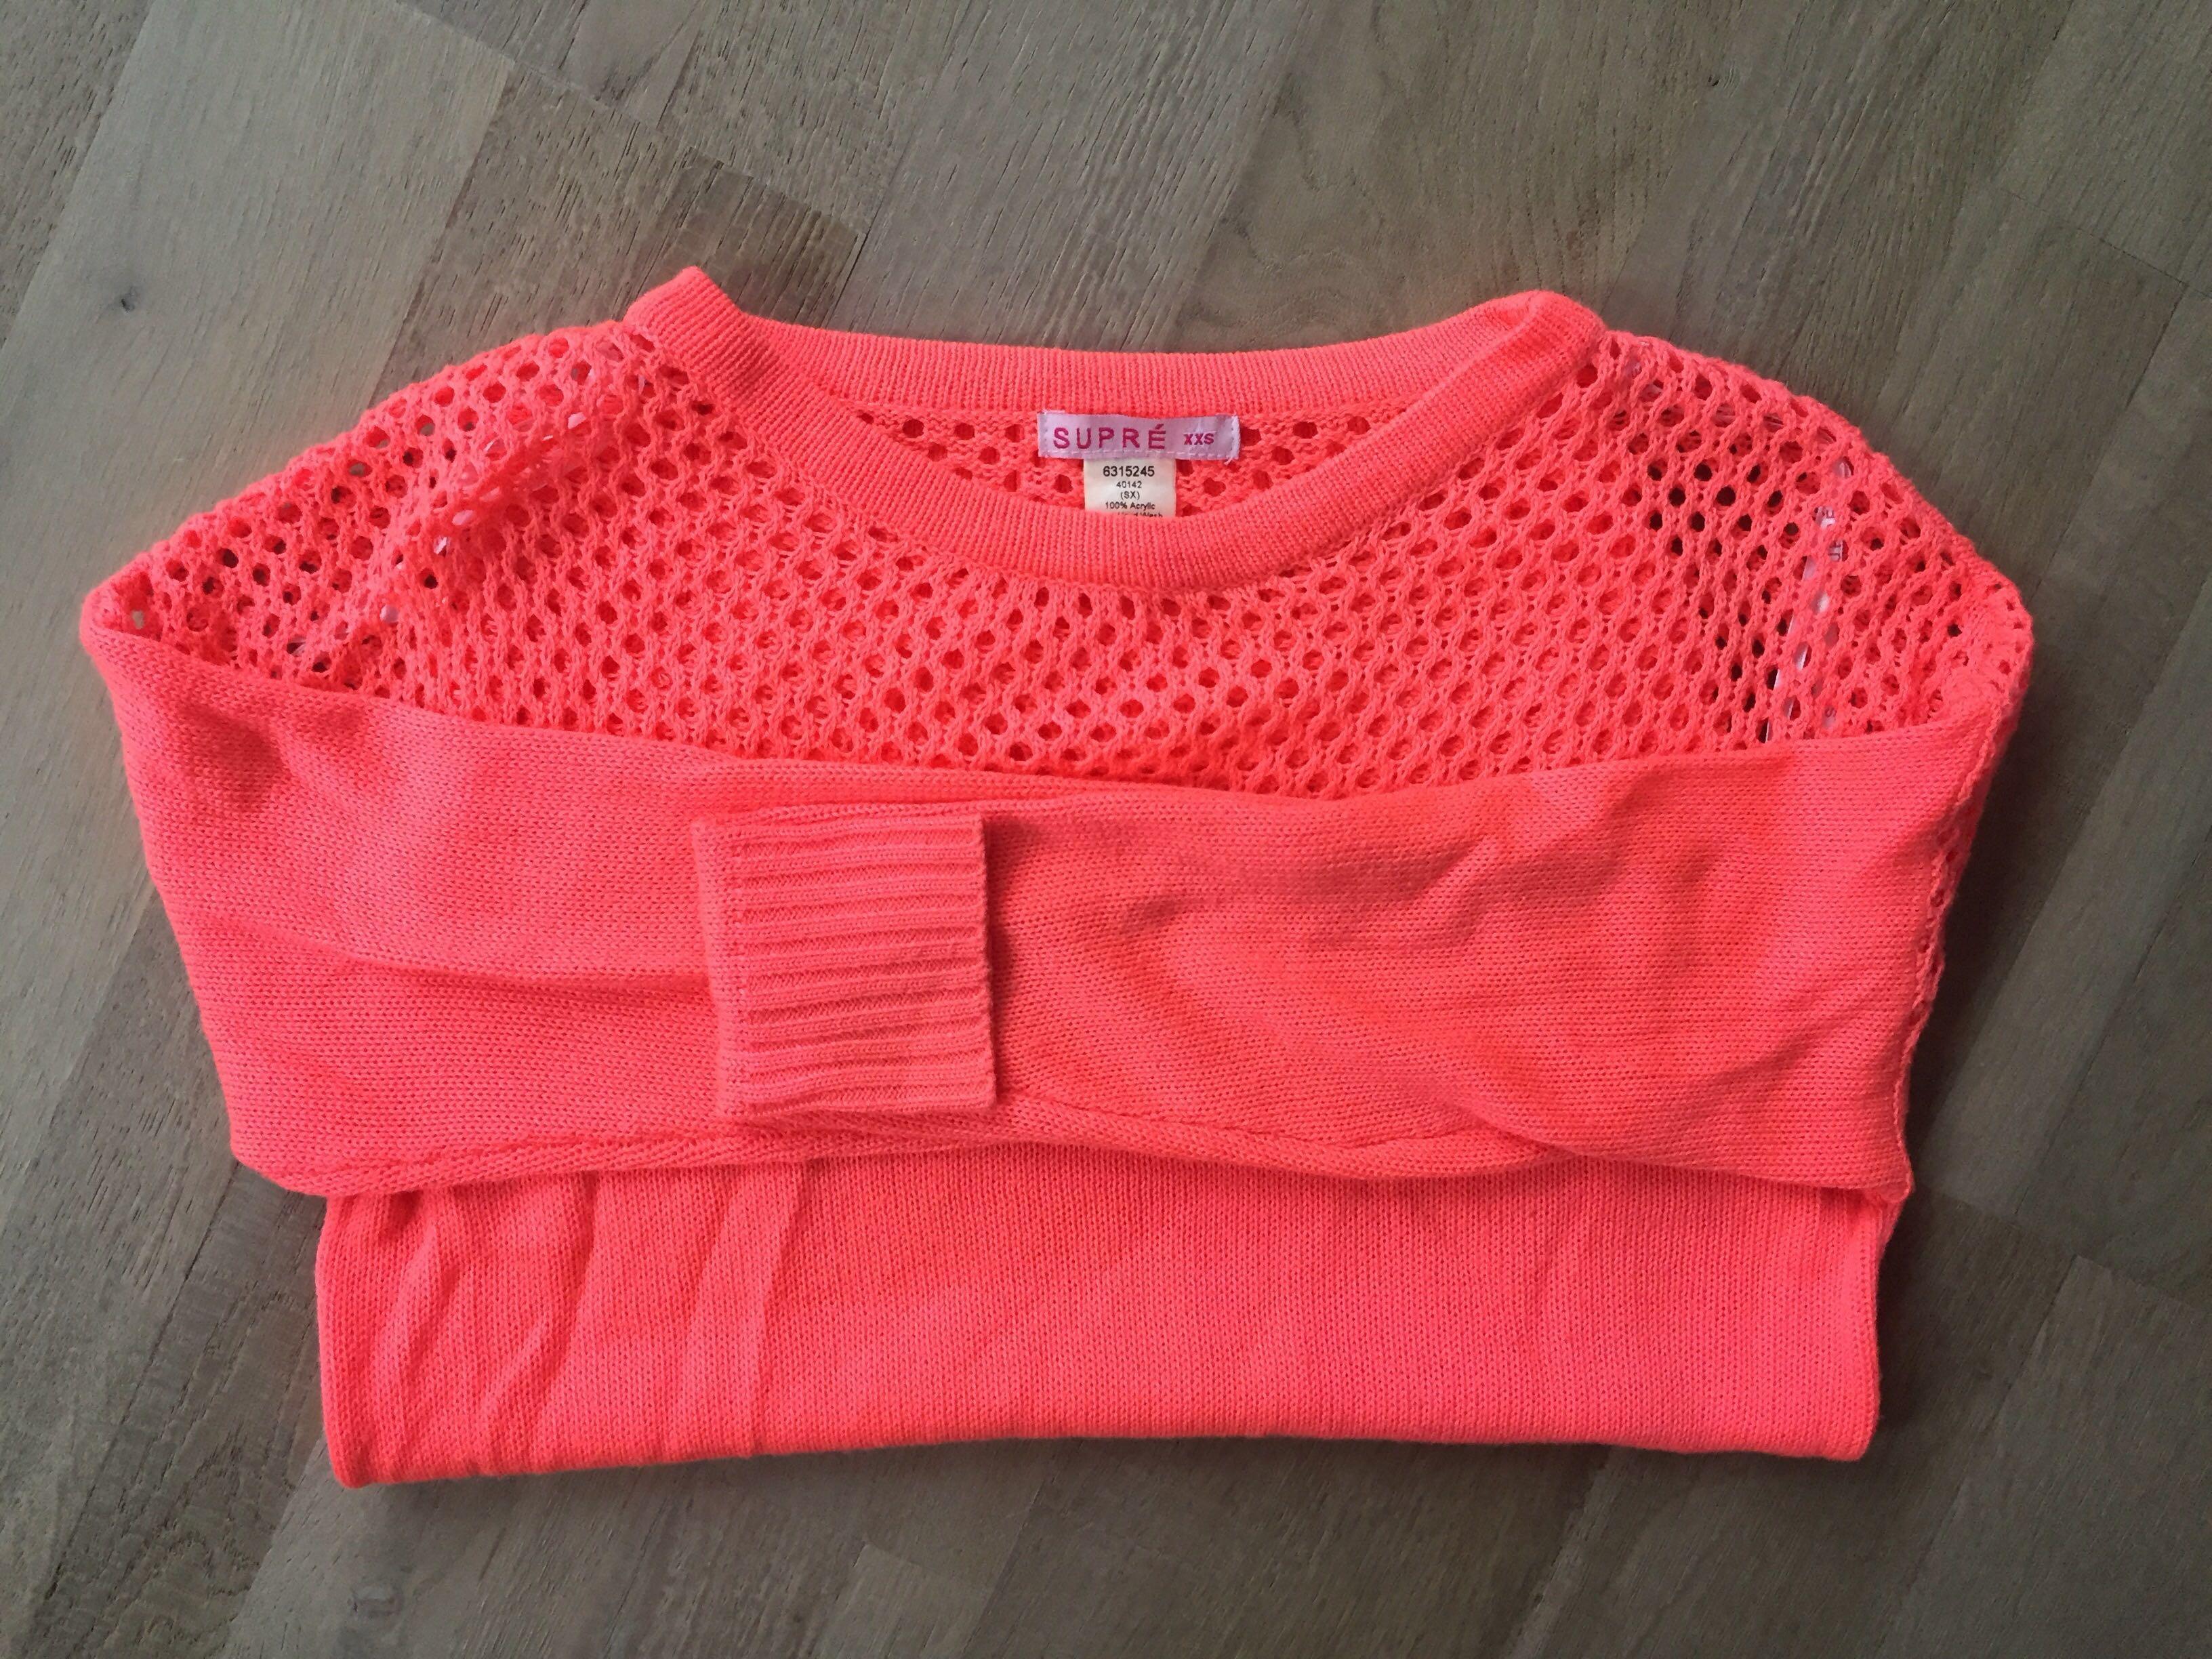 ❤️Size xxs (6)bright pink jumper. Excellent condition